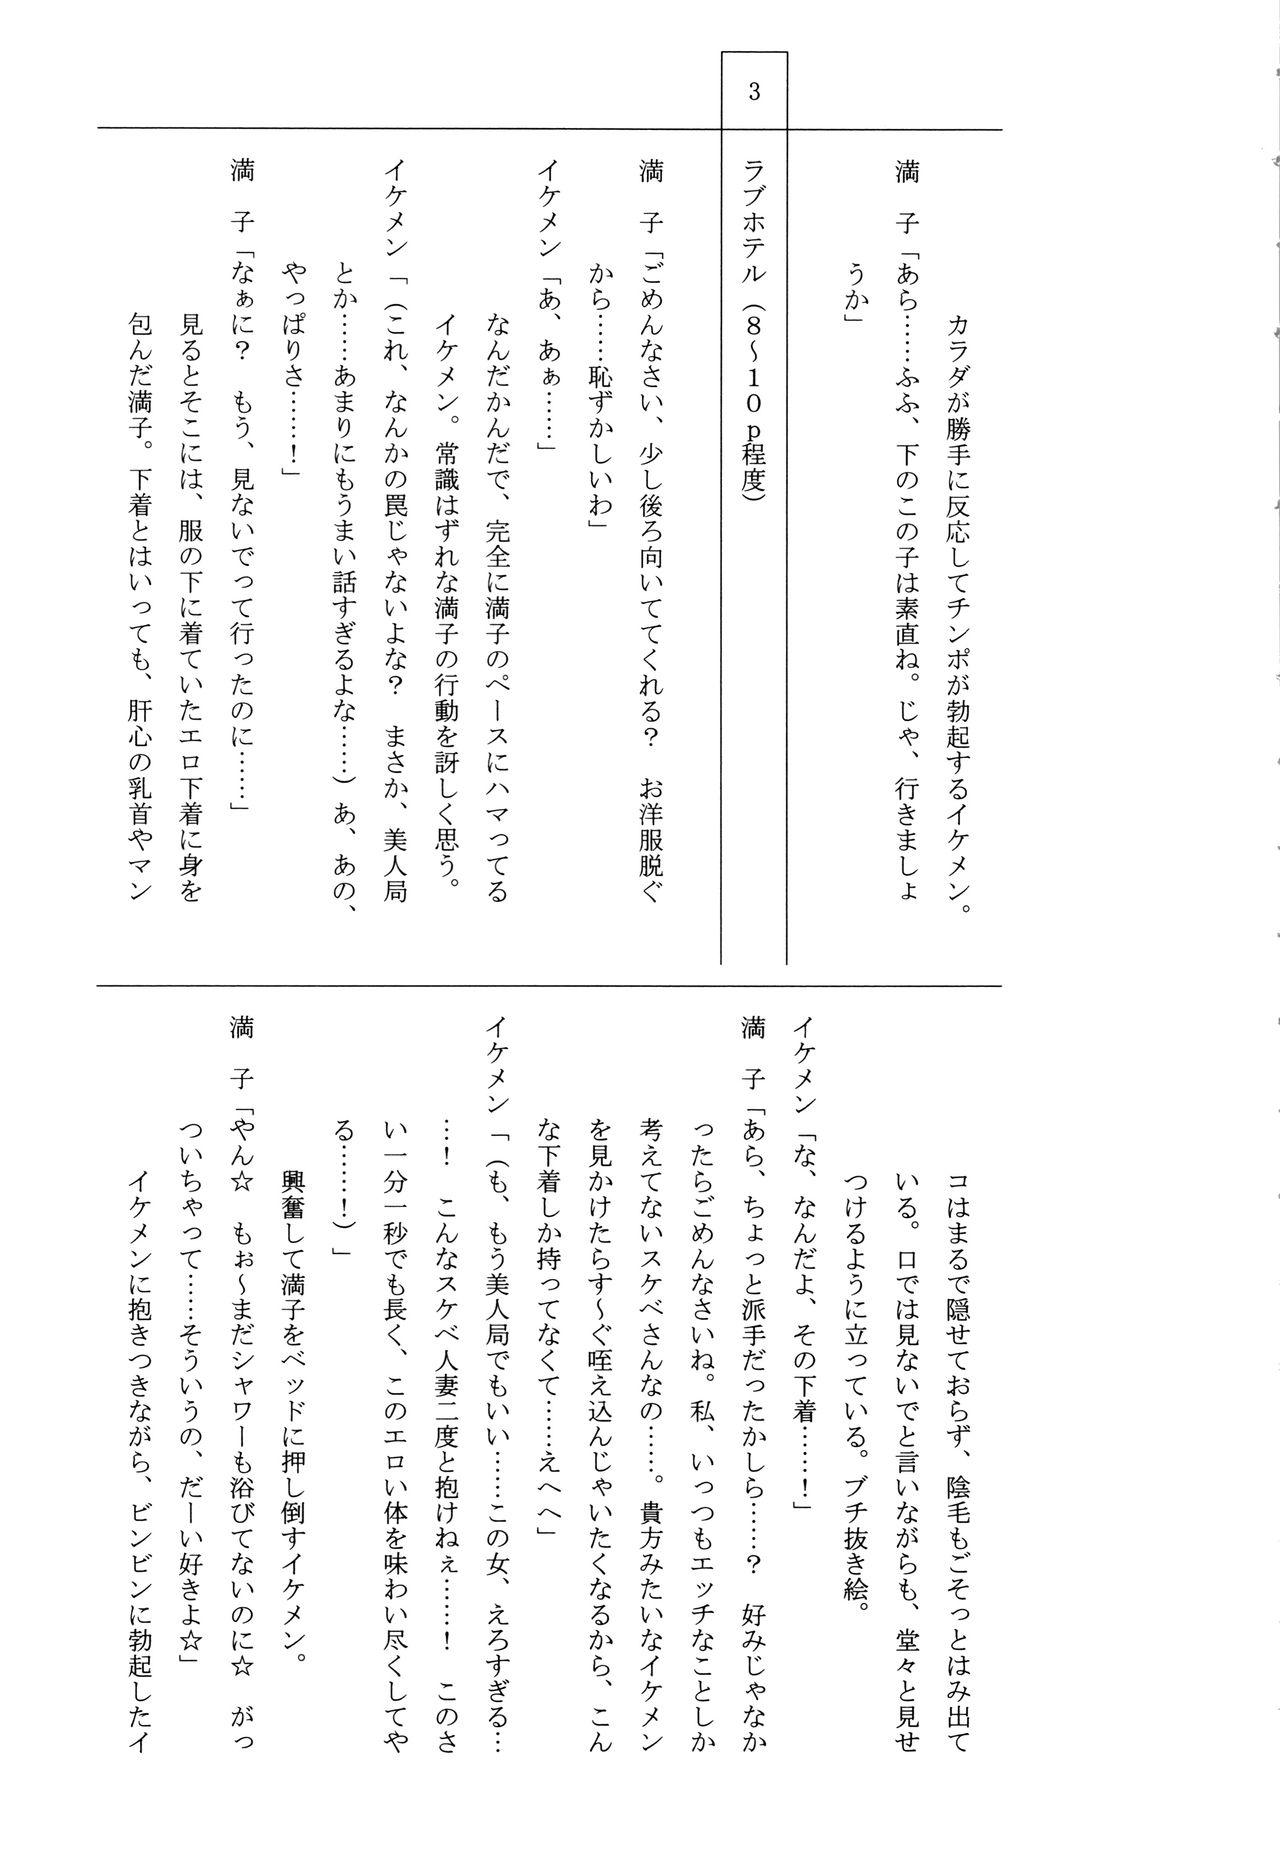 Teisou Kannen ZERO Shinsouban 1 190